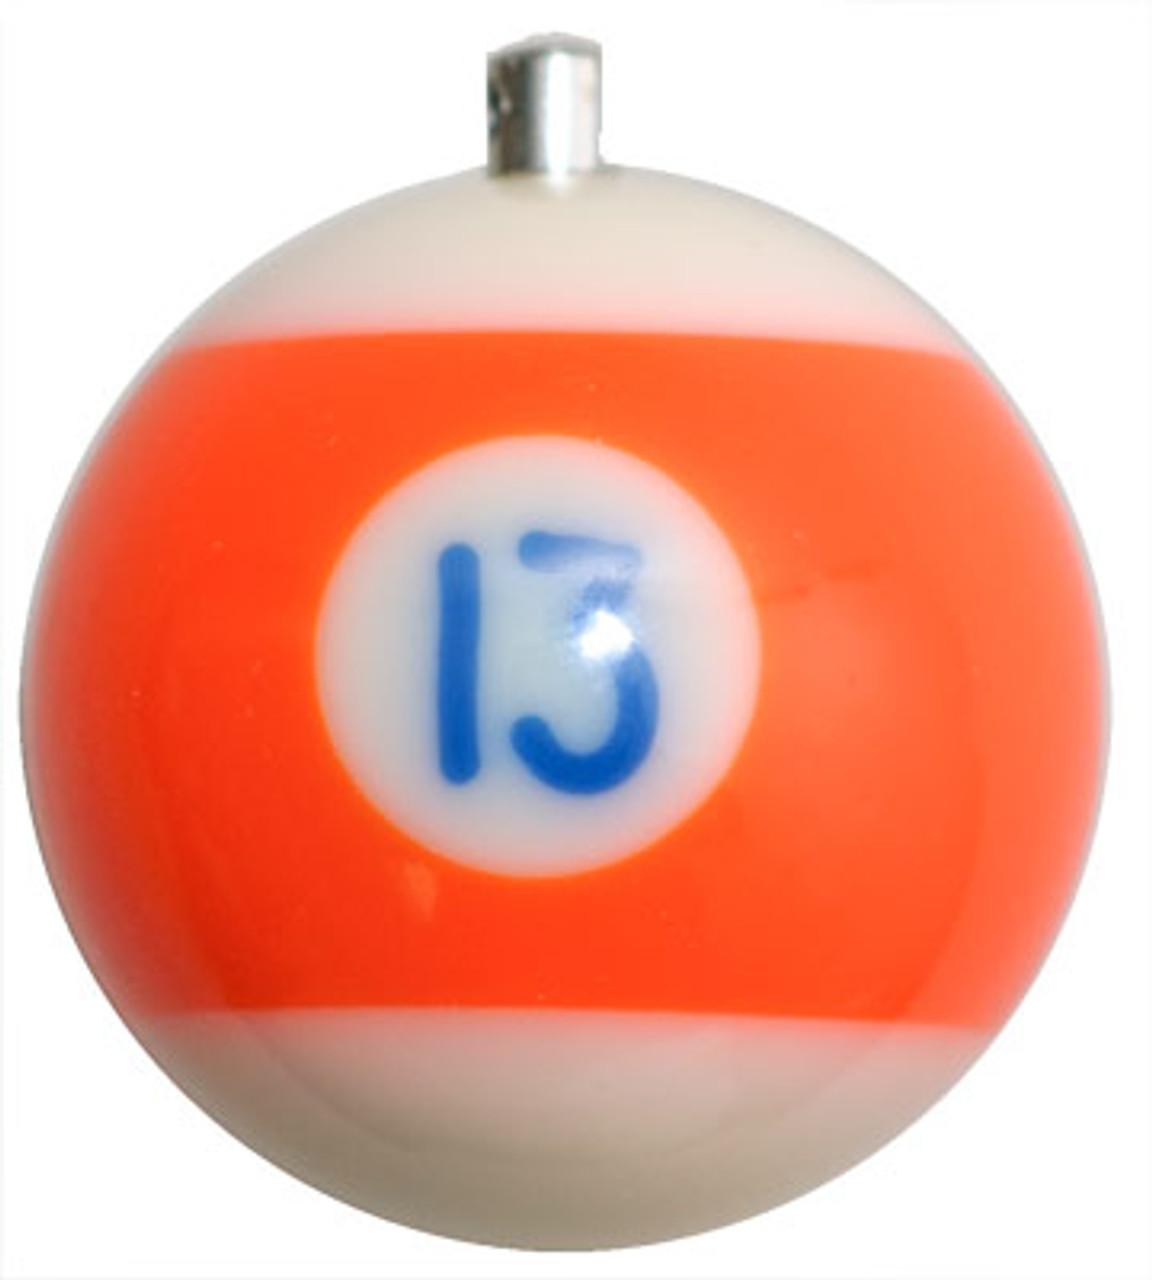 Billiard Ball Christmas Tree Ornaments - #13